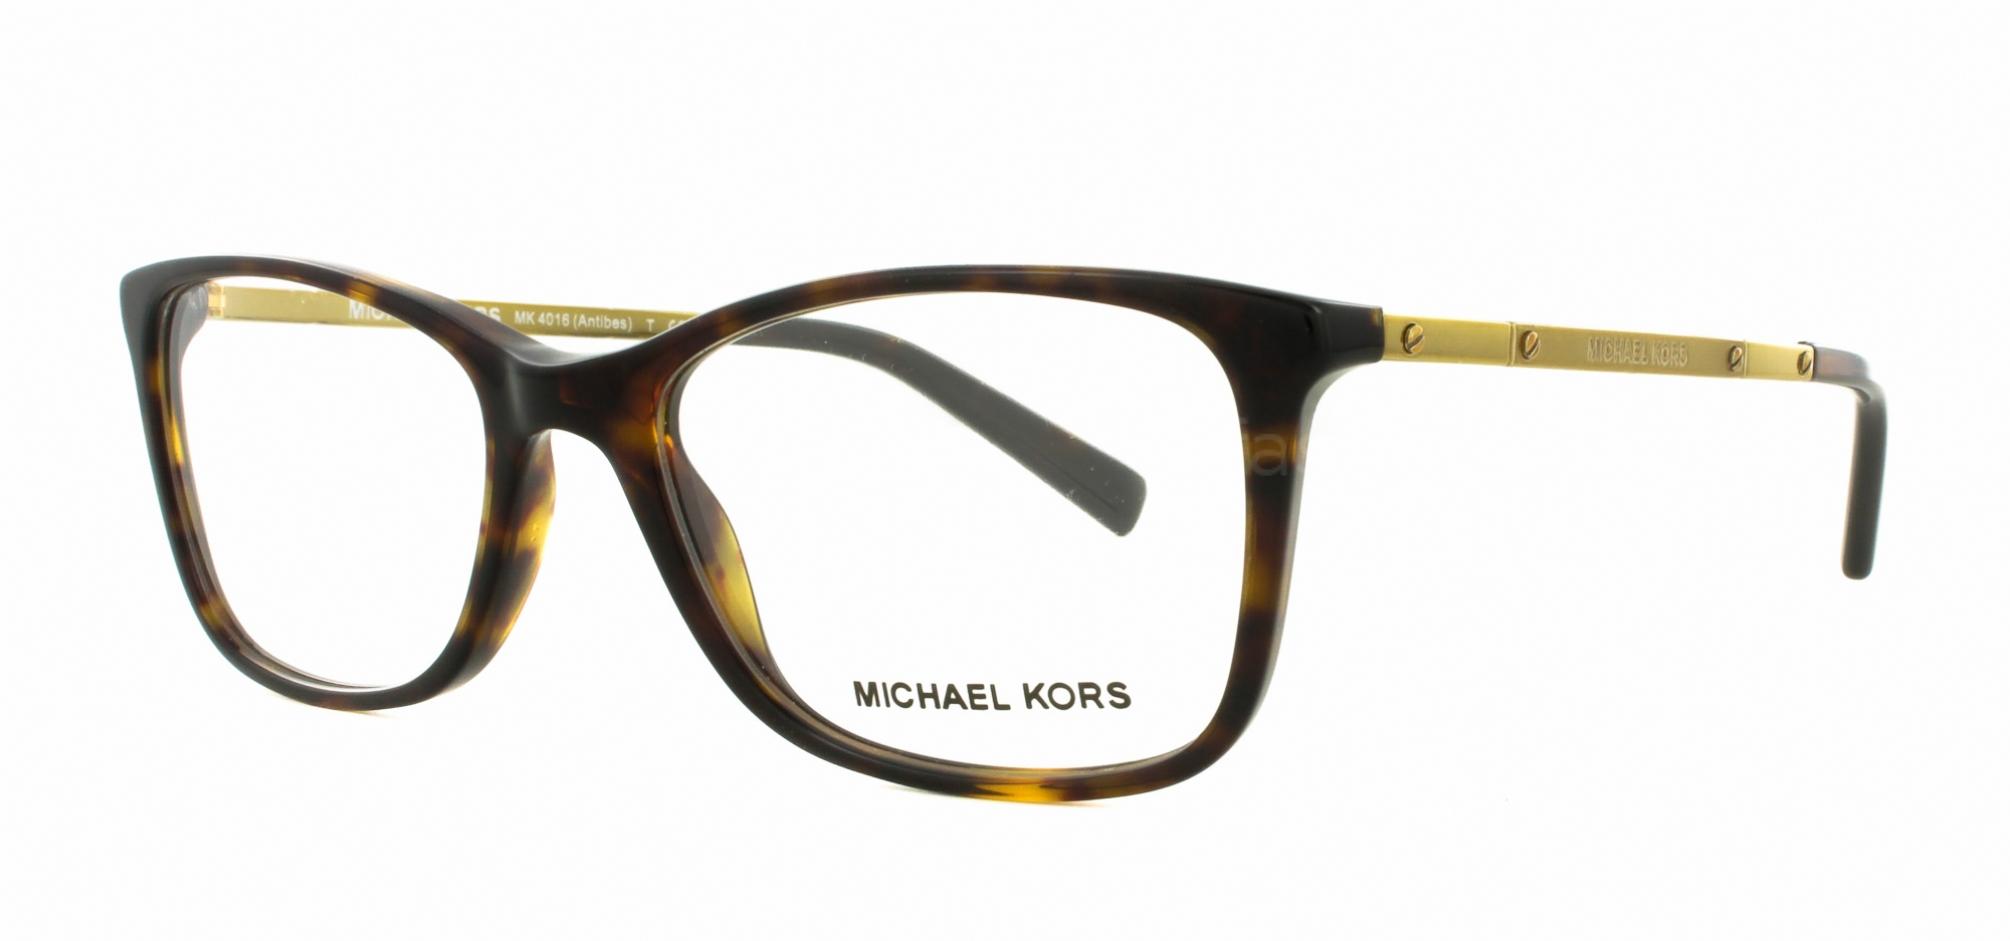 MICHAEL KORS ANTIBES 4016 3006